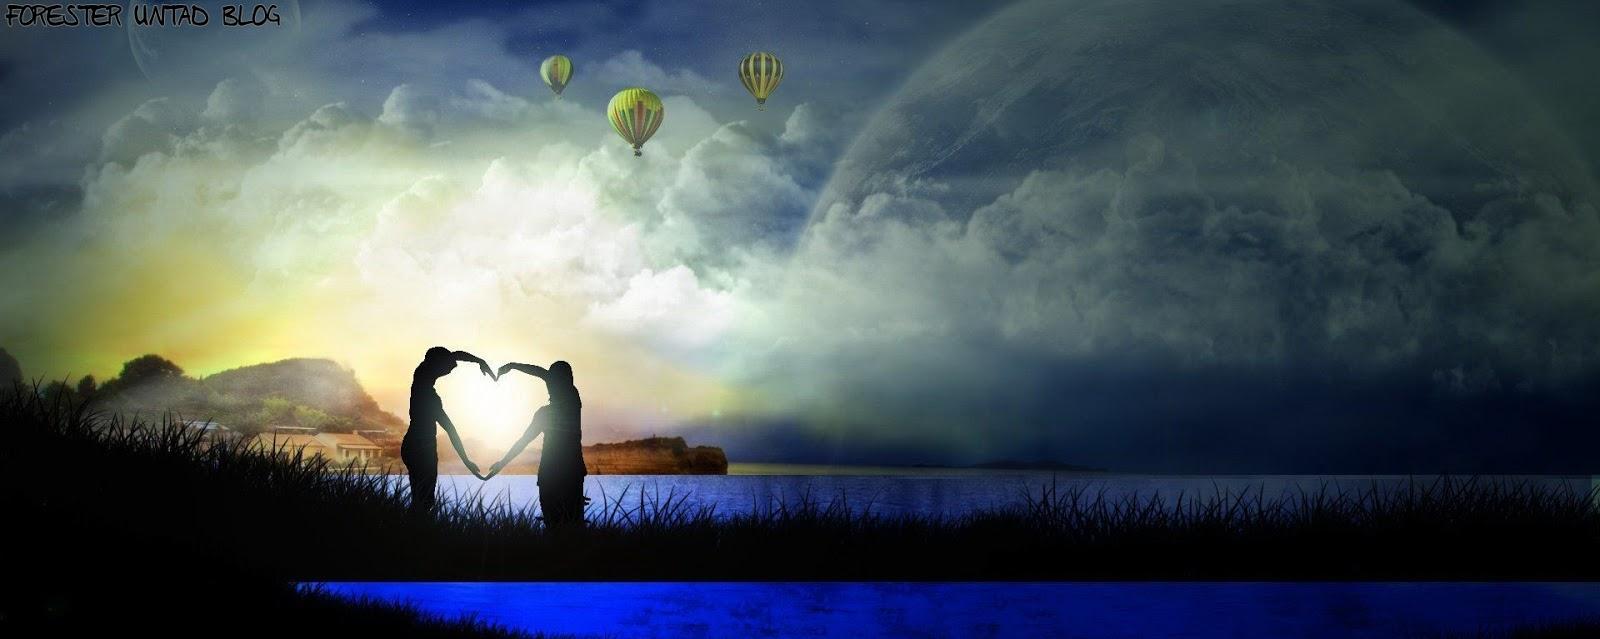 Foto Sampul Fb Keren Love Romantis FORESTER UNTAD BLOG